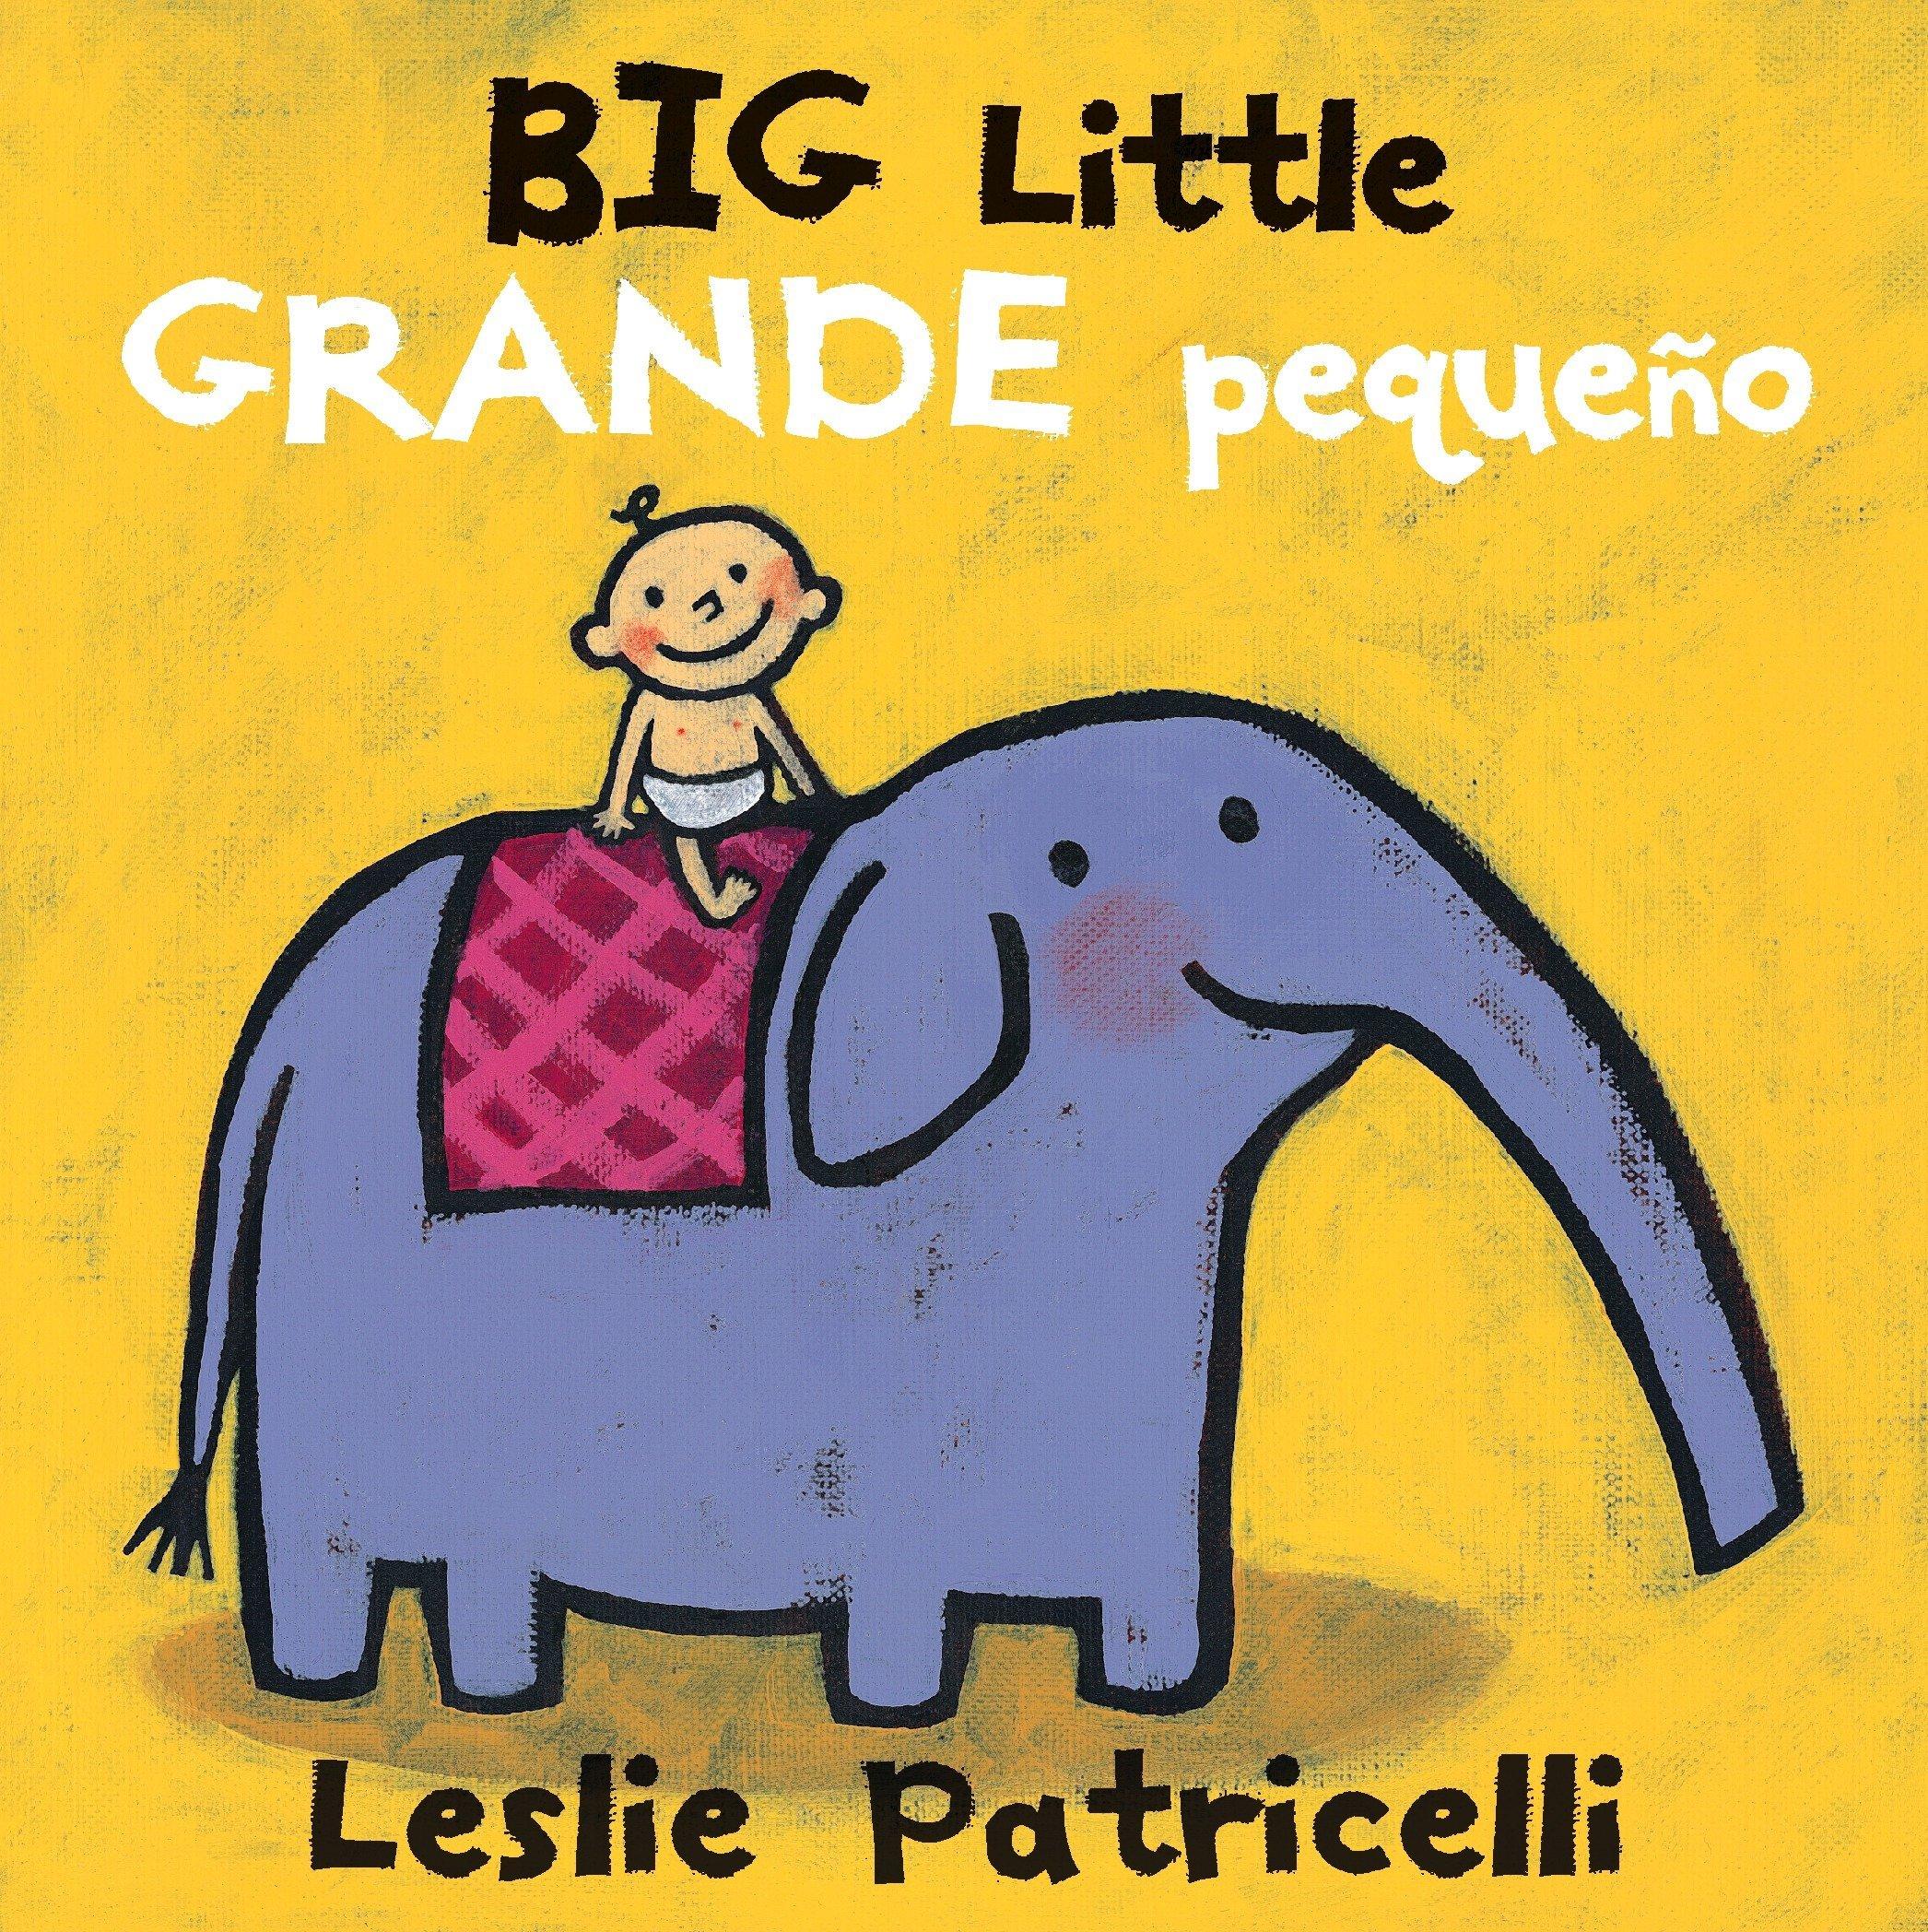 Big Little / Grande pequeño (Leslie Patricelli board books) (Spanish Edition) ebook